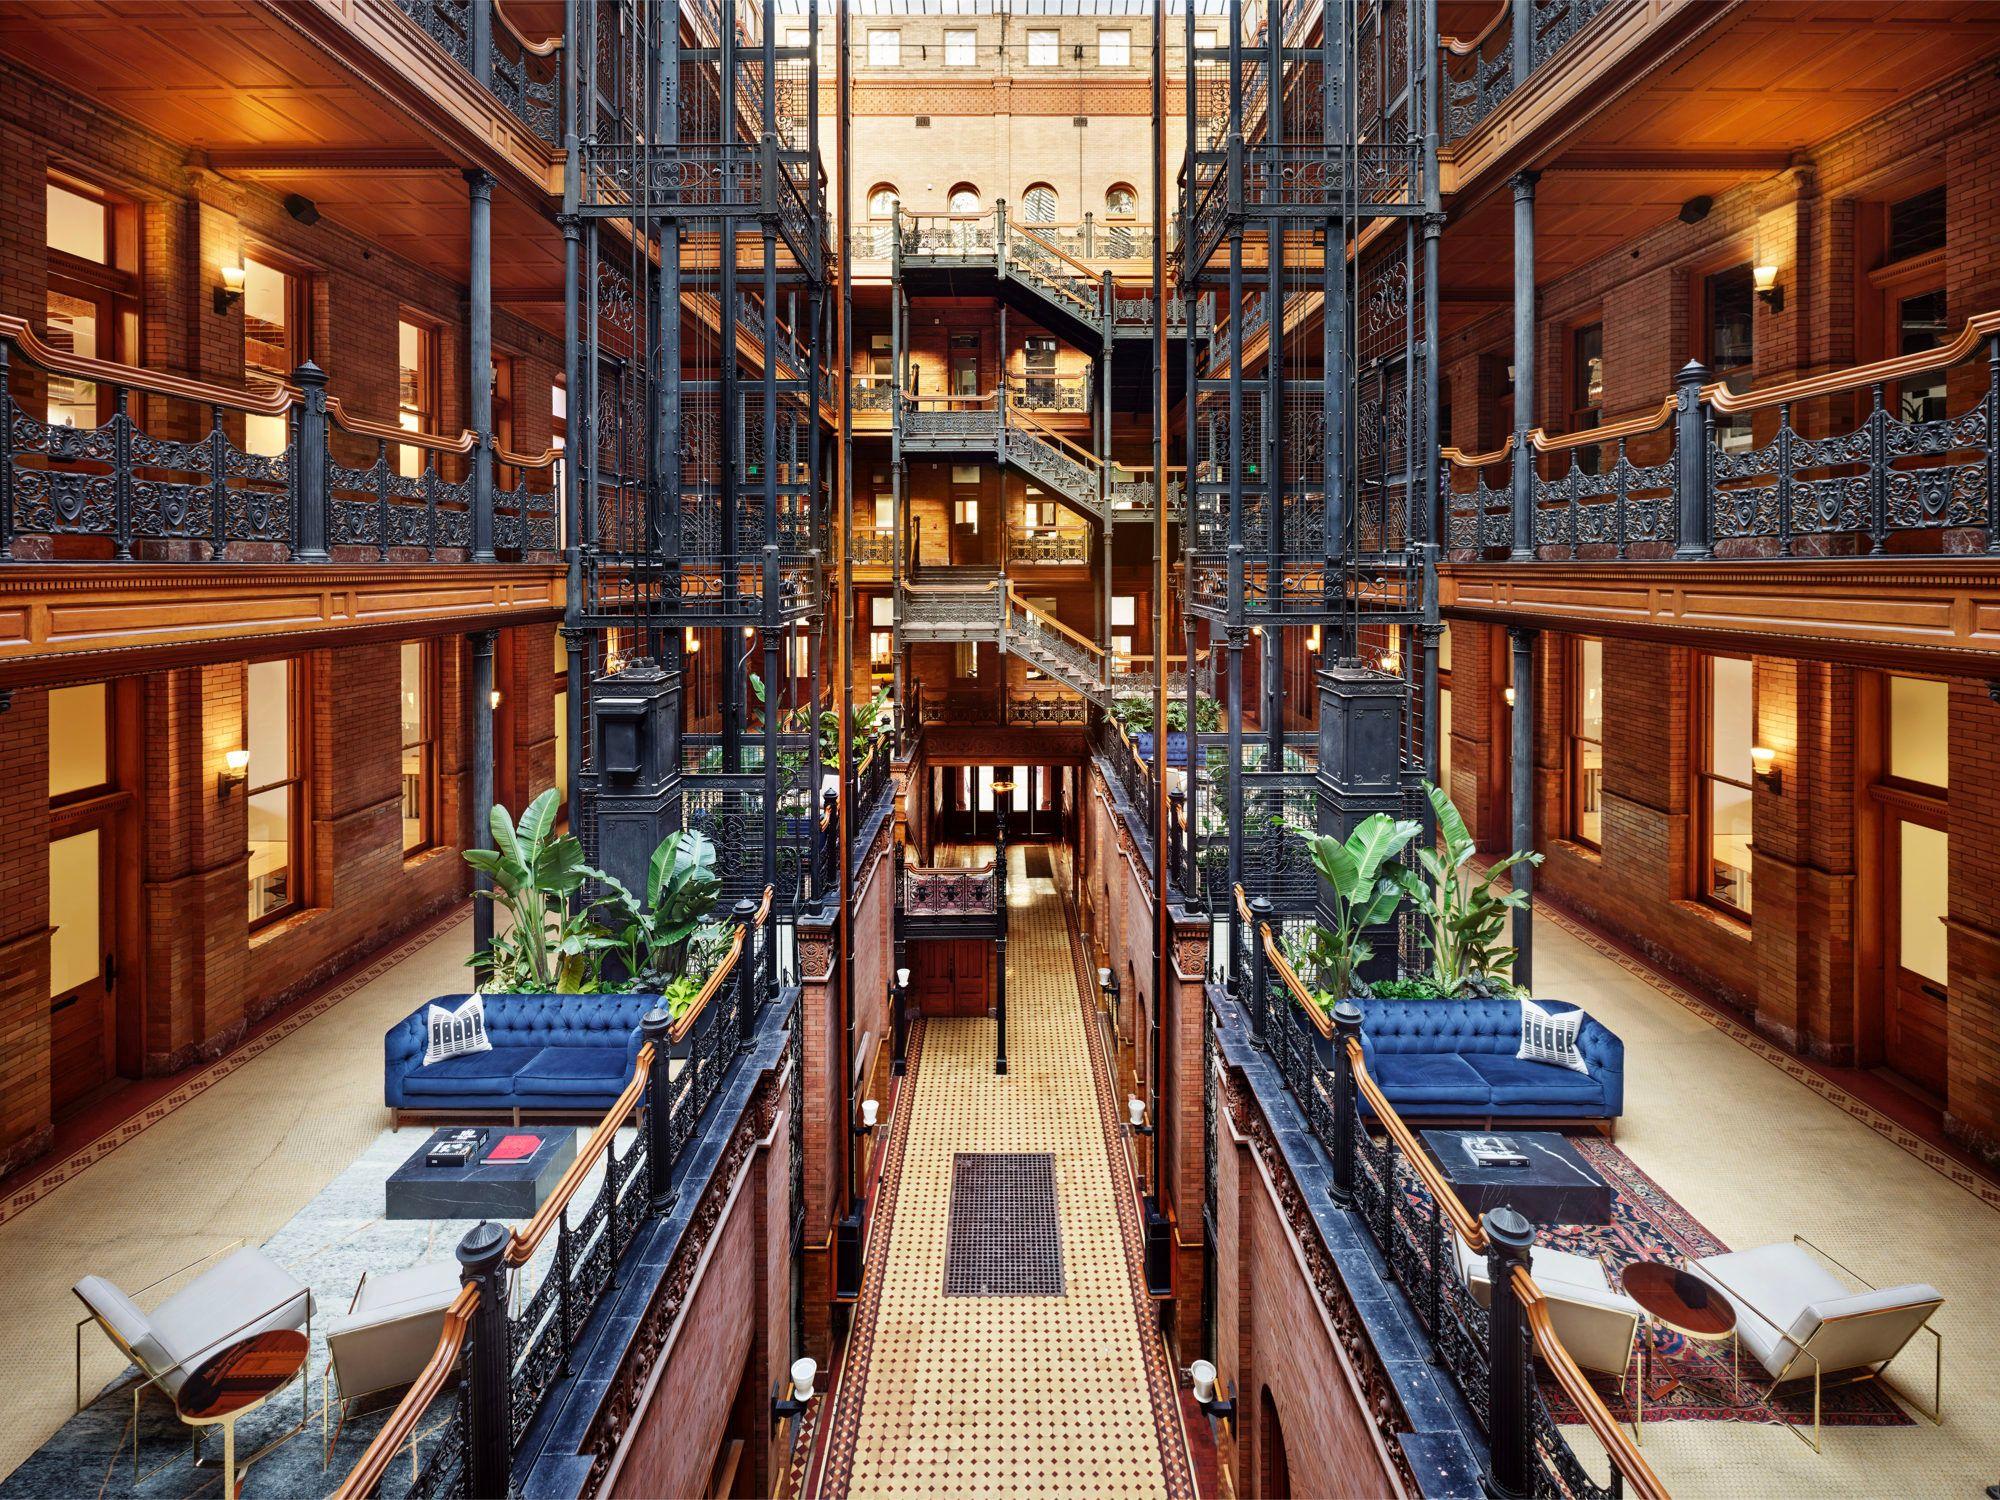 NeueHouse Bradbury in 2020 Architecture, Bradbury